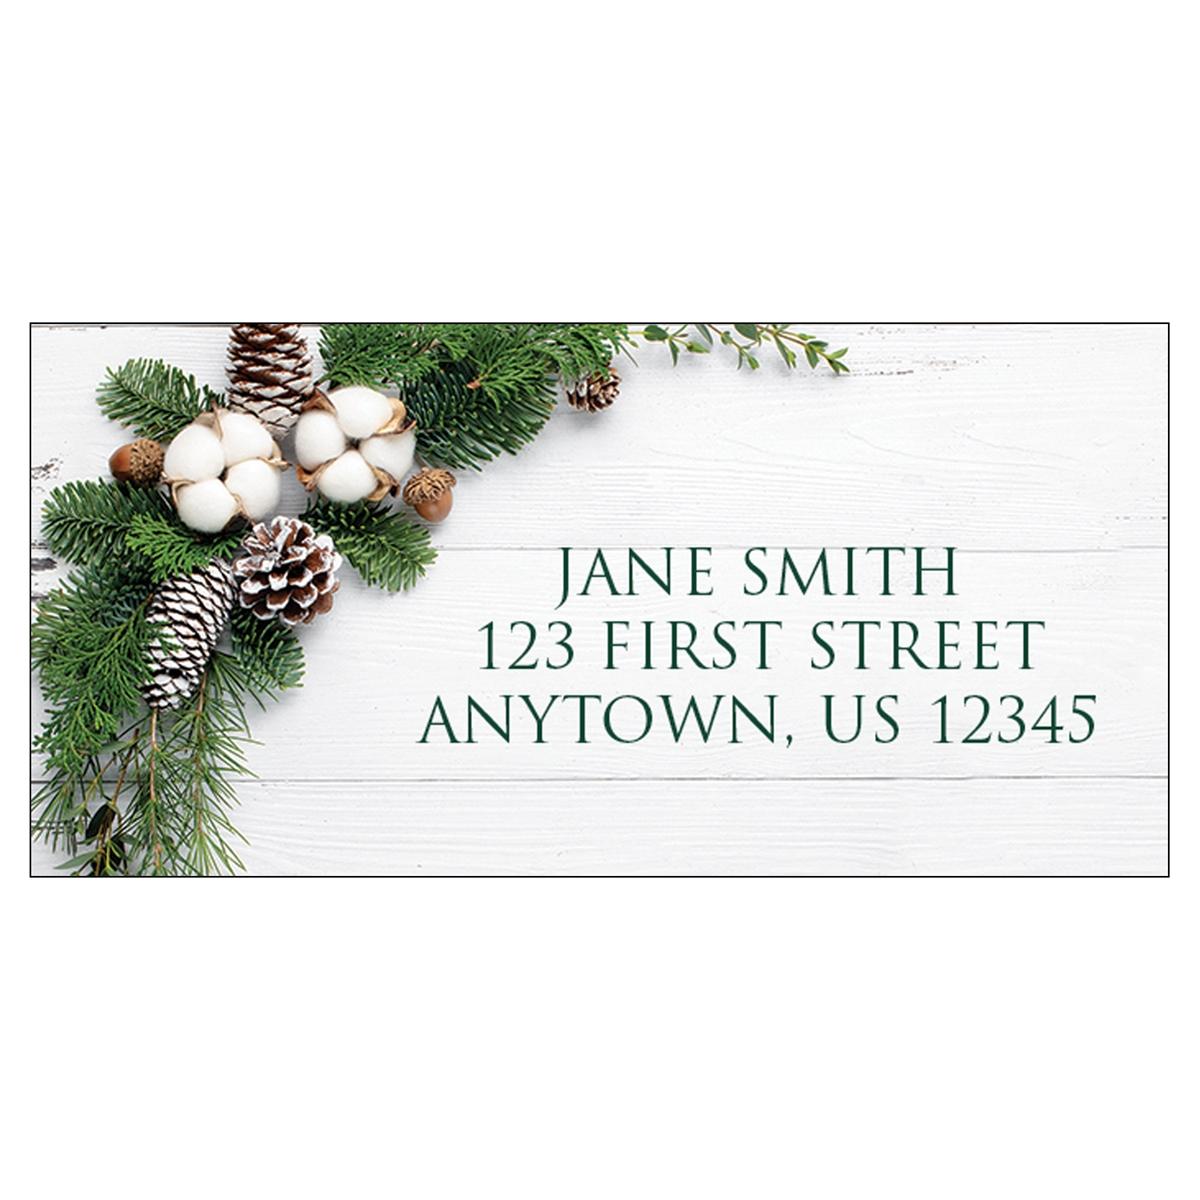 Rustic Style Address Label